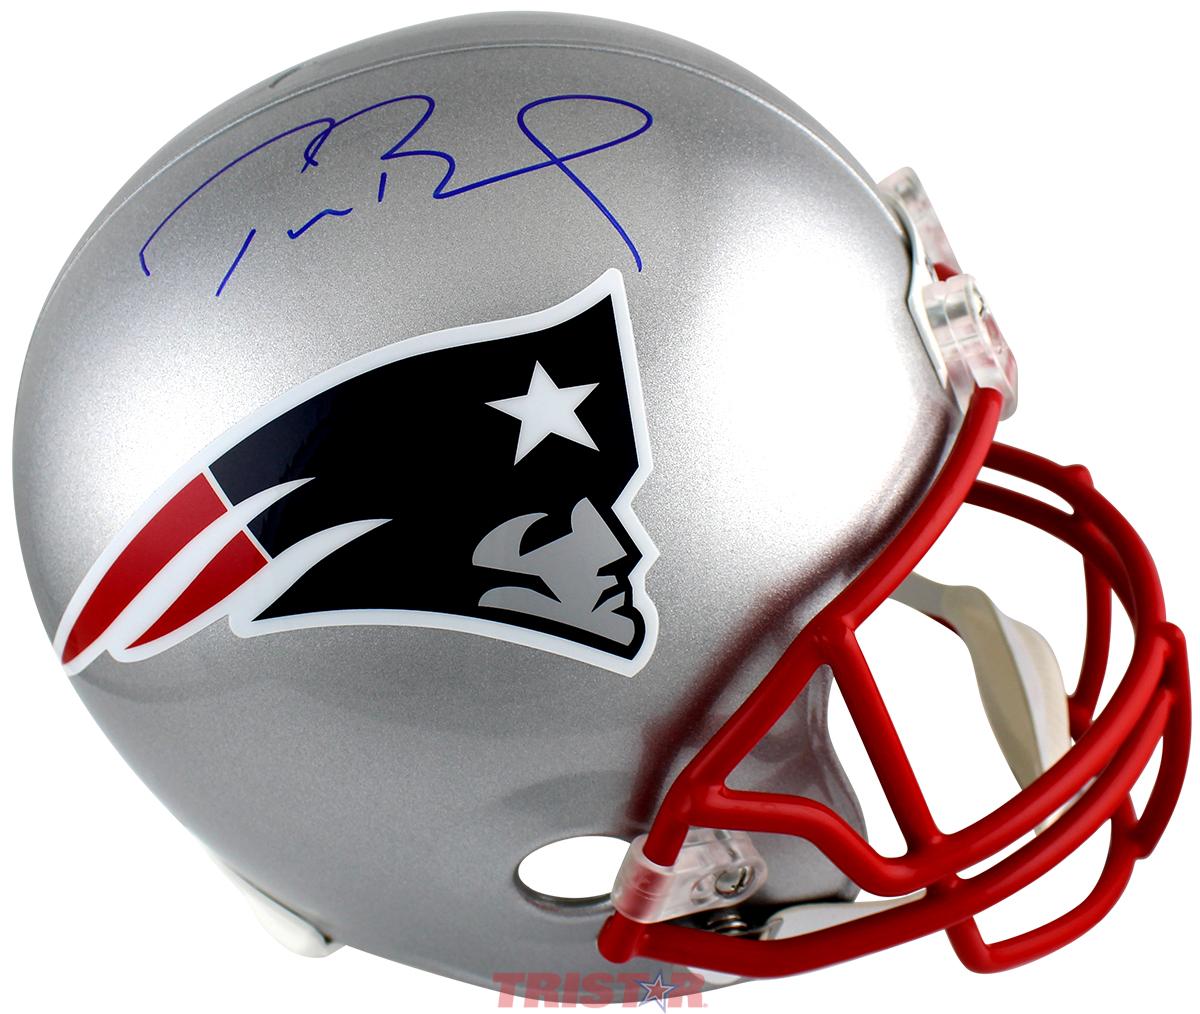 low priced 0c94d 1778f Tom Brady Autographed New England Patriots Replica Full Size Helmet